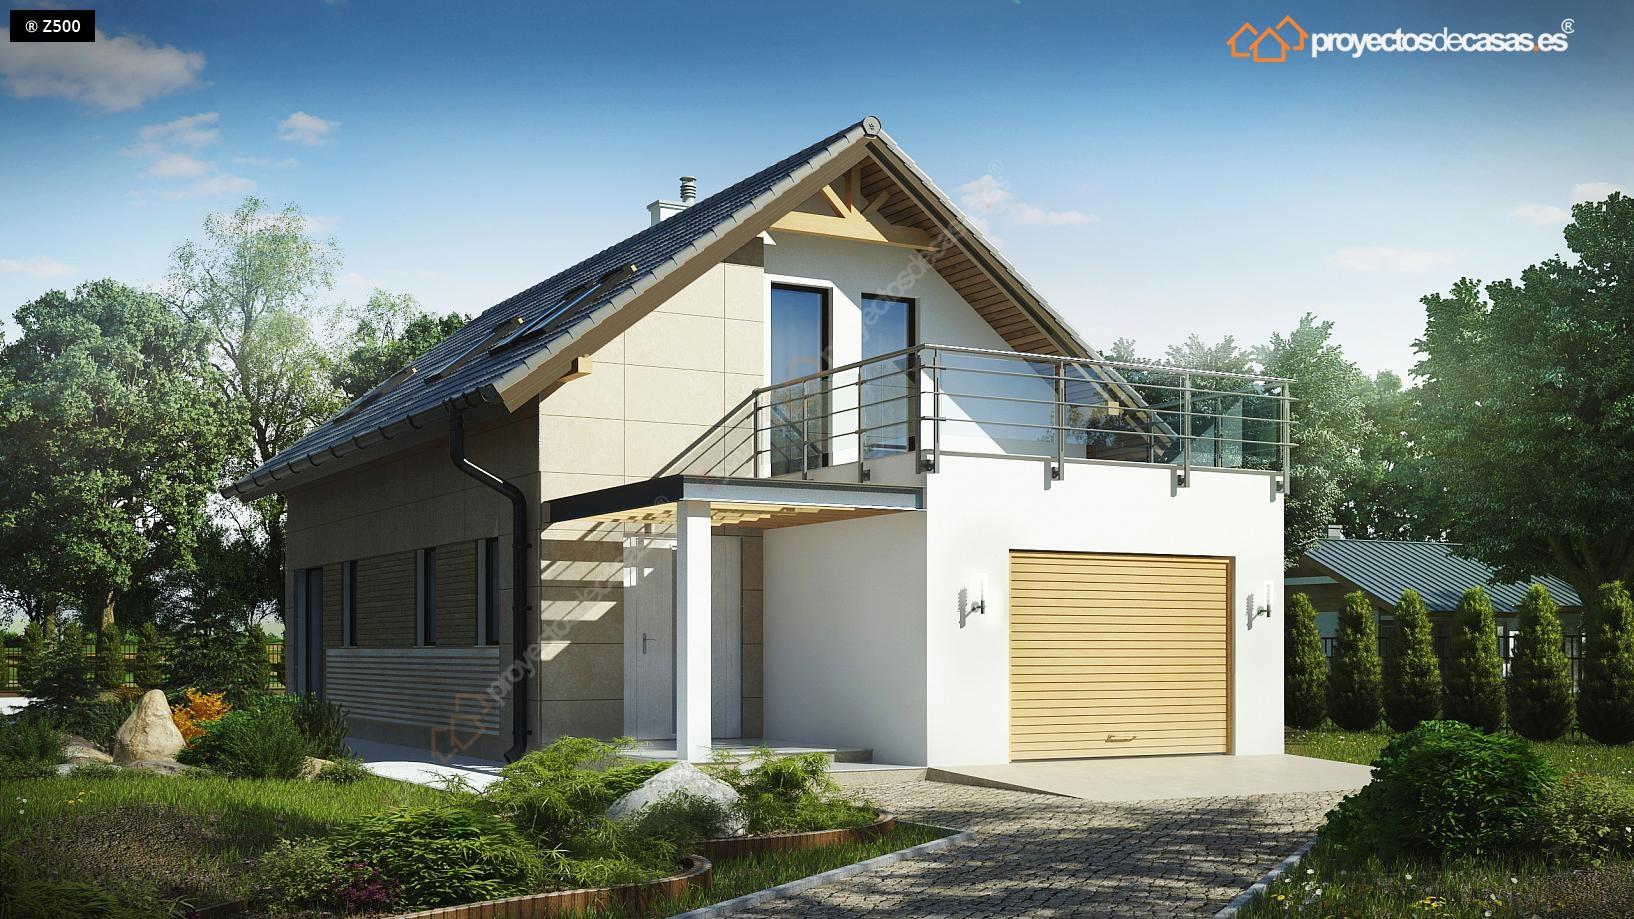 Proyectos de casas casa tradicional proyectosdecasas dise amos y construimos casas en toda - Casas en hellin ...